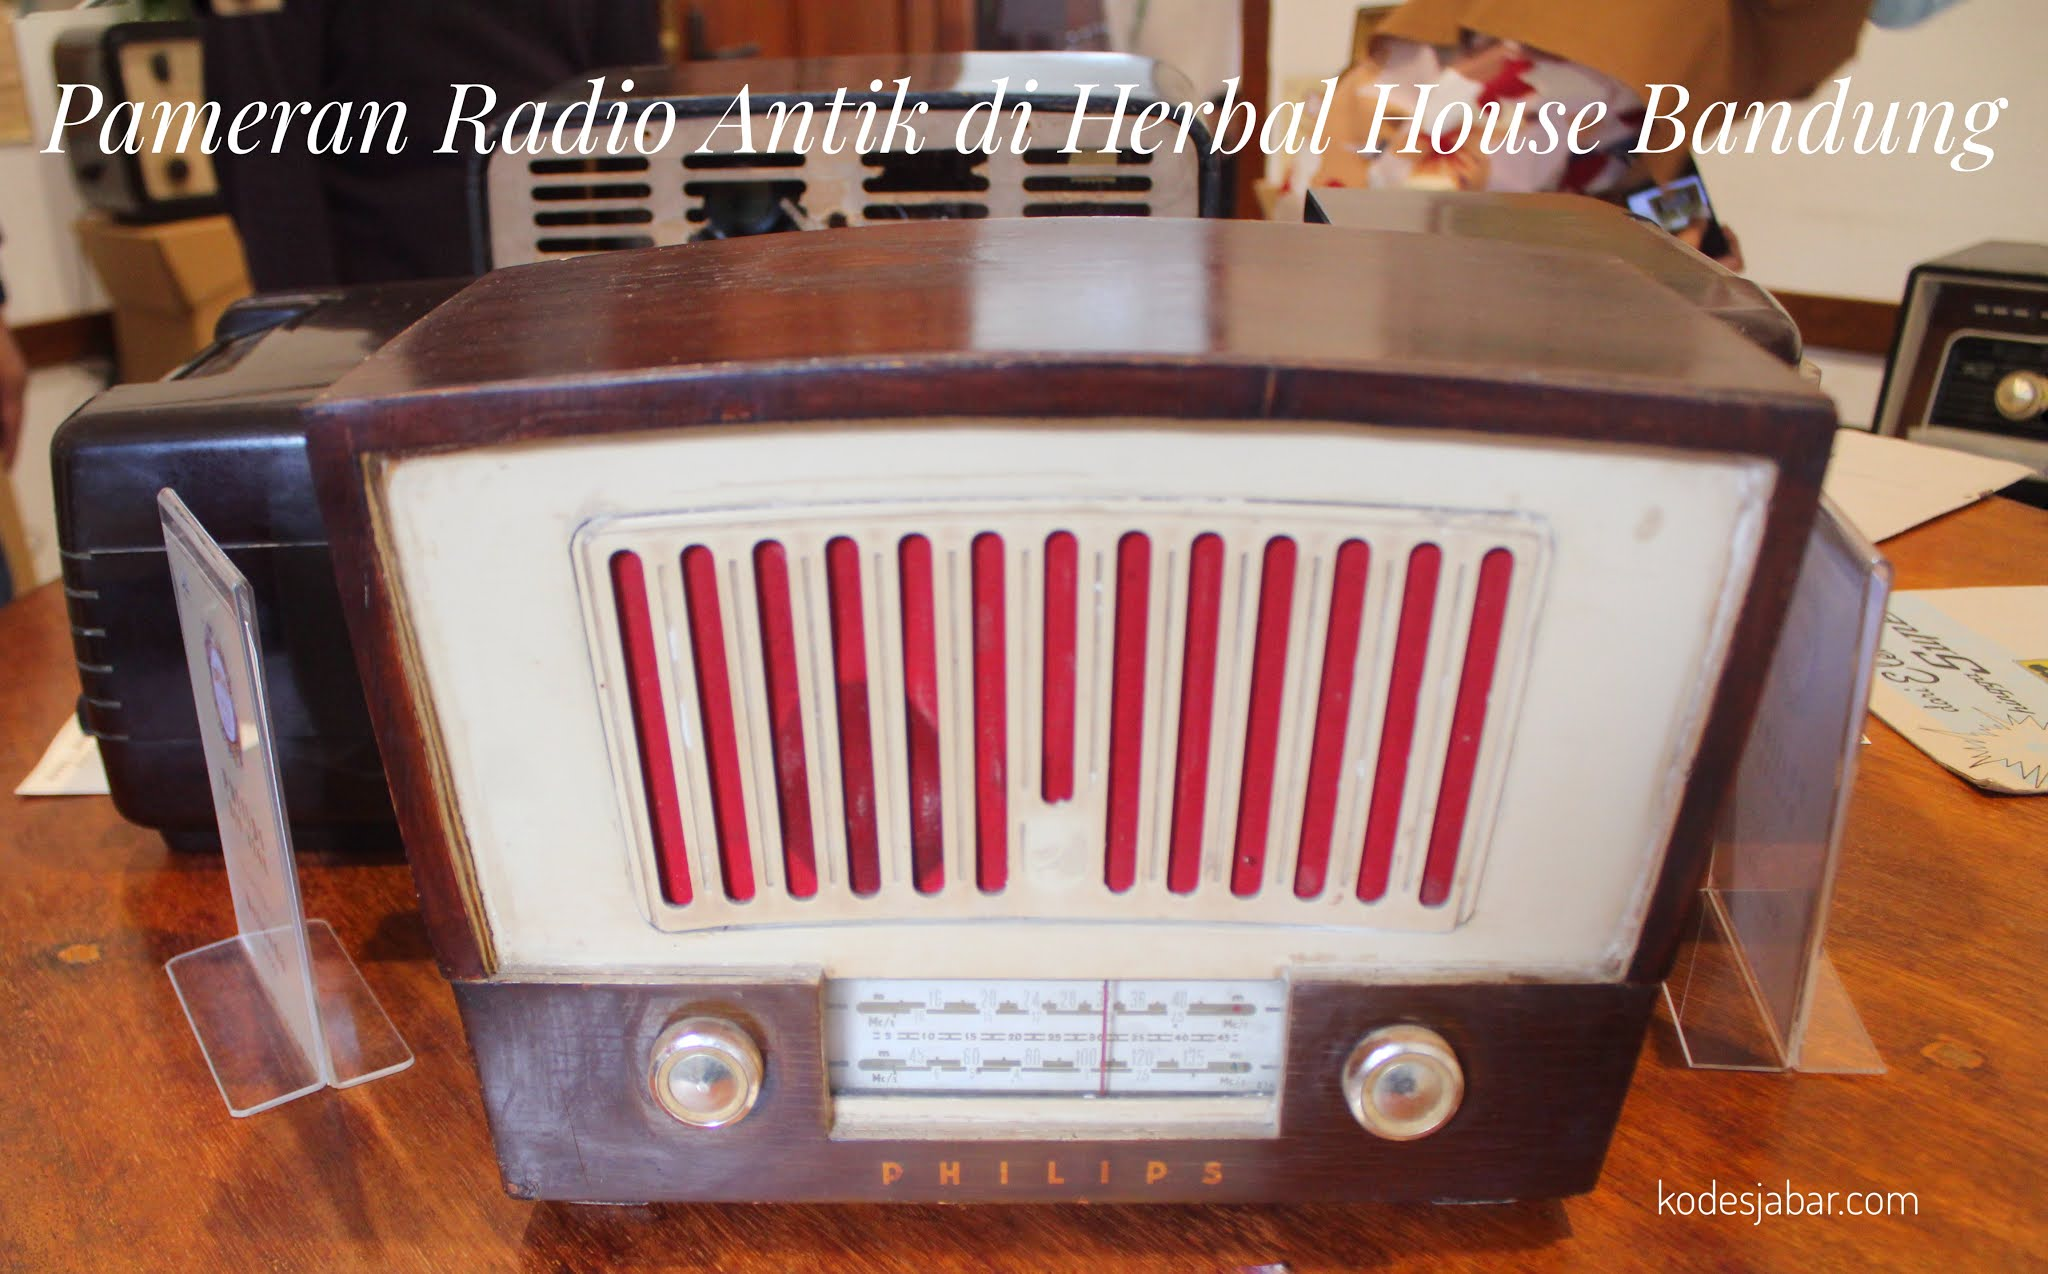 Pameran Radio Antik di Herbal House by The Lodge Bandung